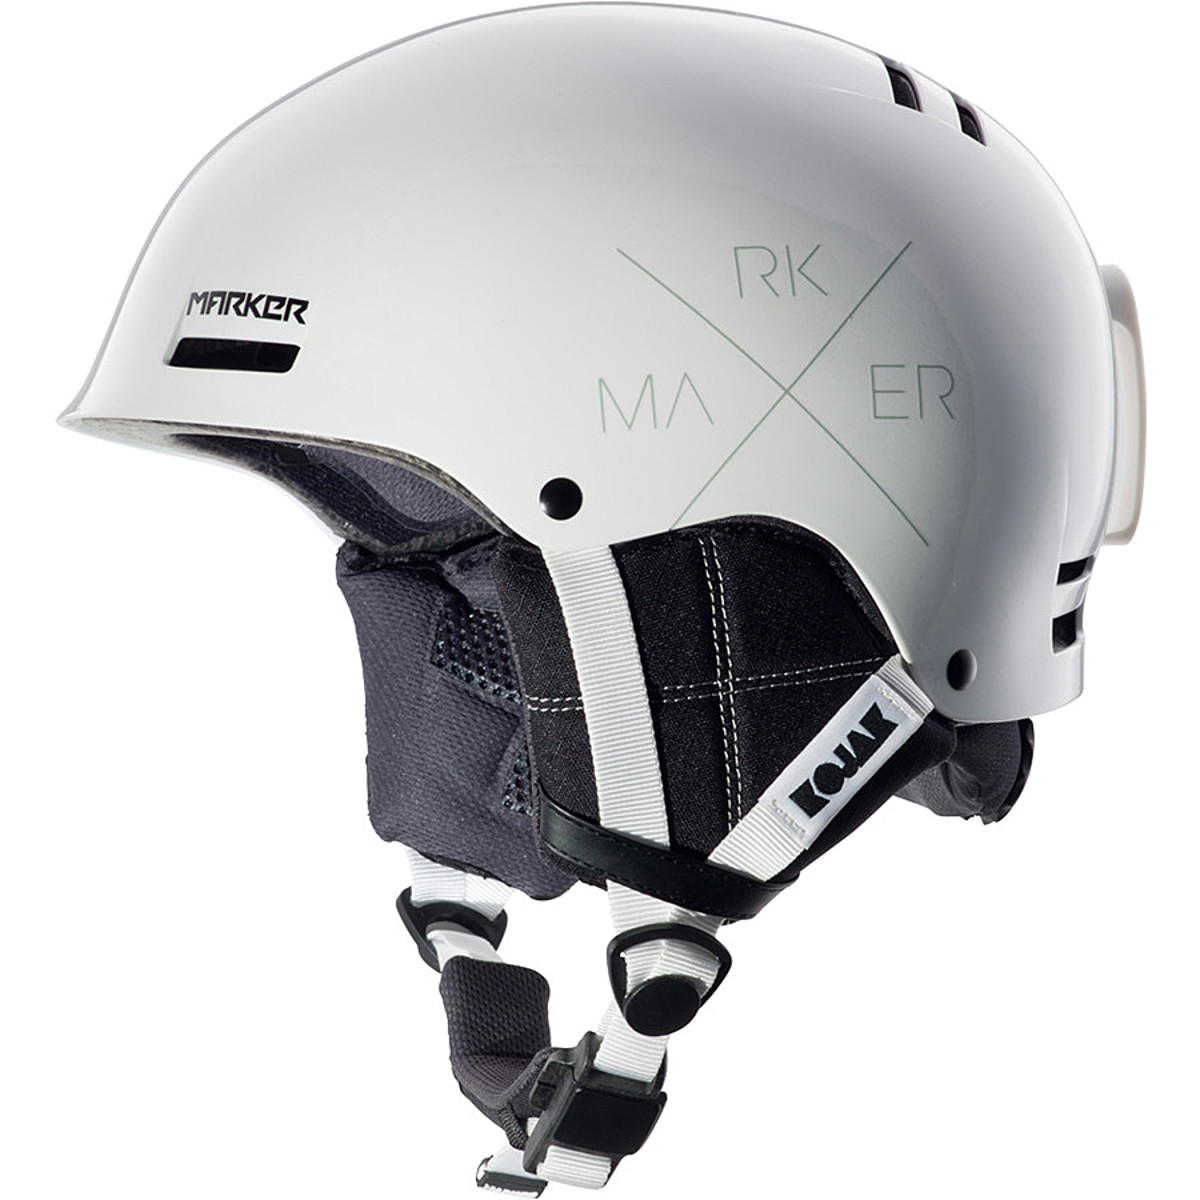 Marker Kojak Helmet